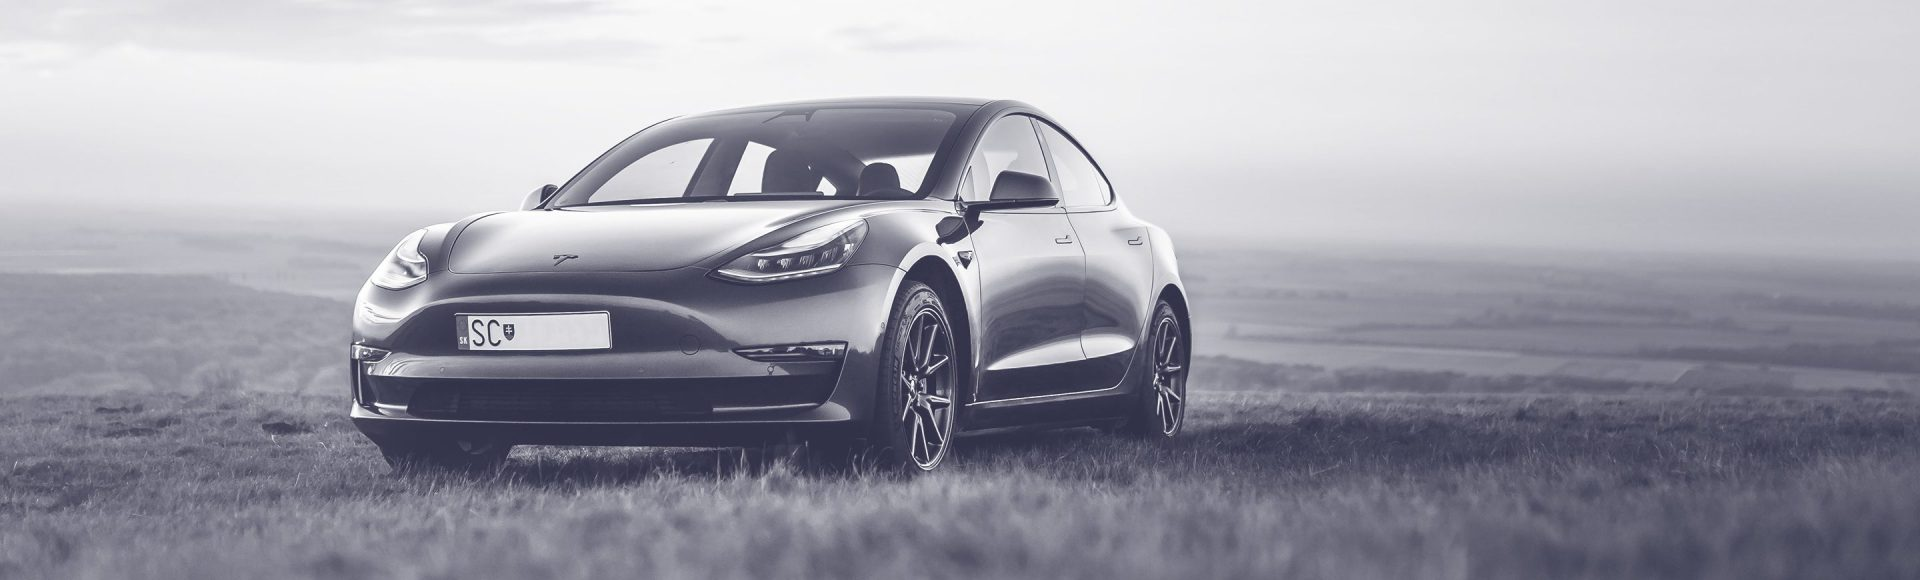 ARK-Invest_Blog-Banner_2014_04_21---Tesla-Gigafactory